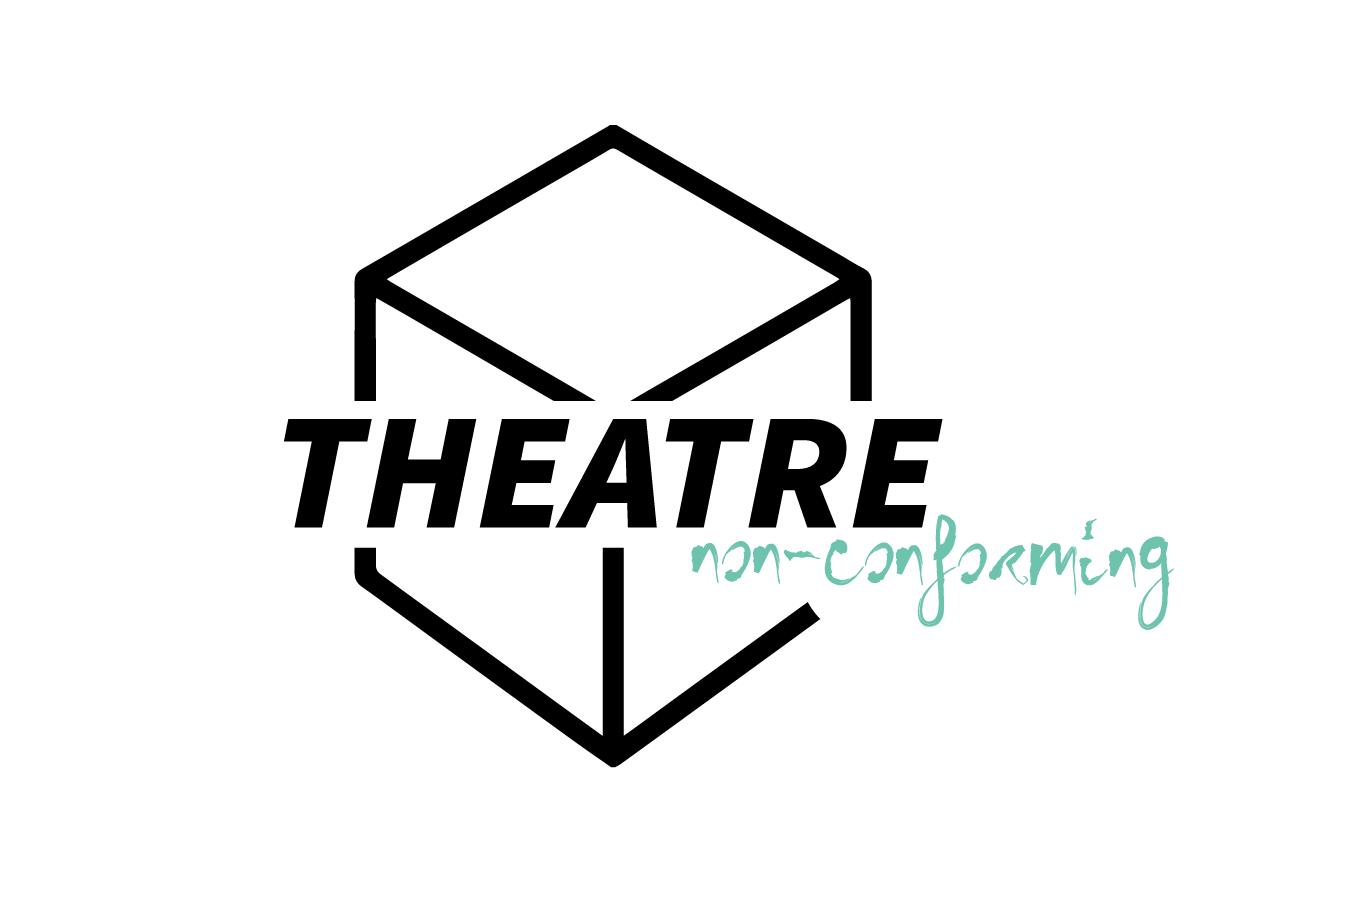 TheatreNonConforming